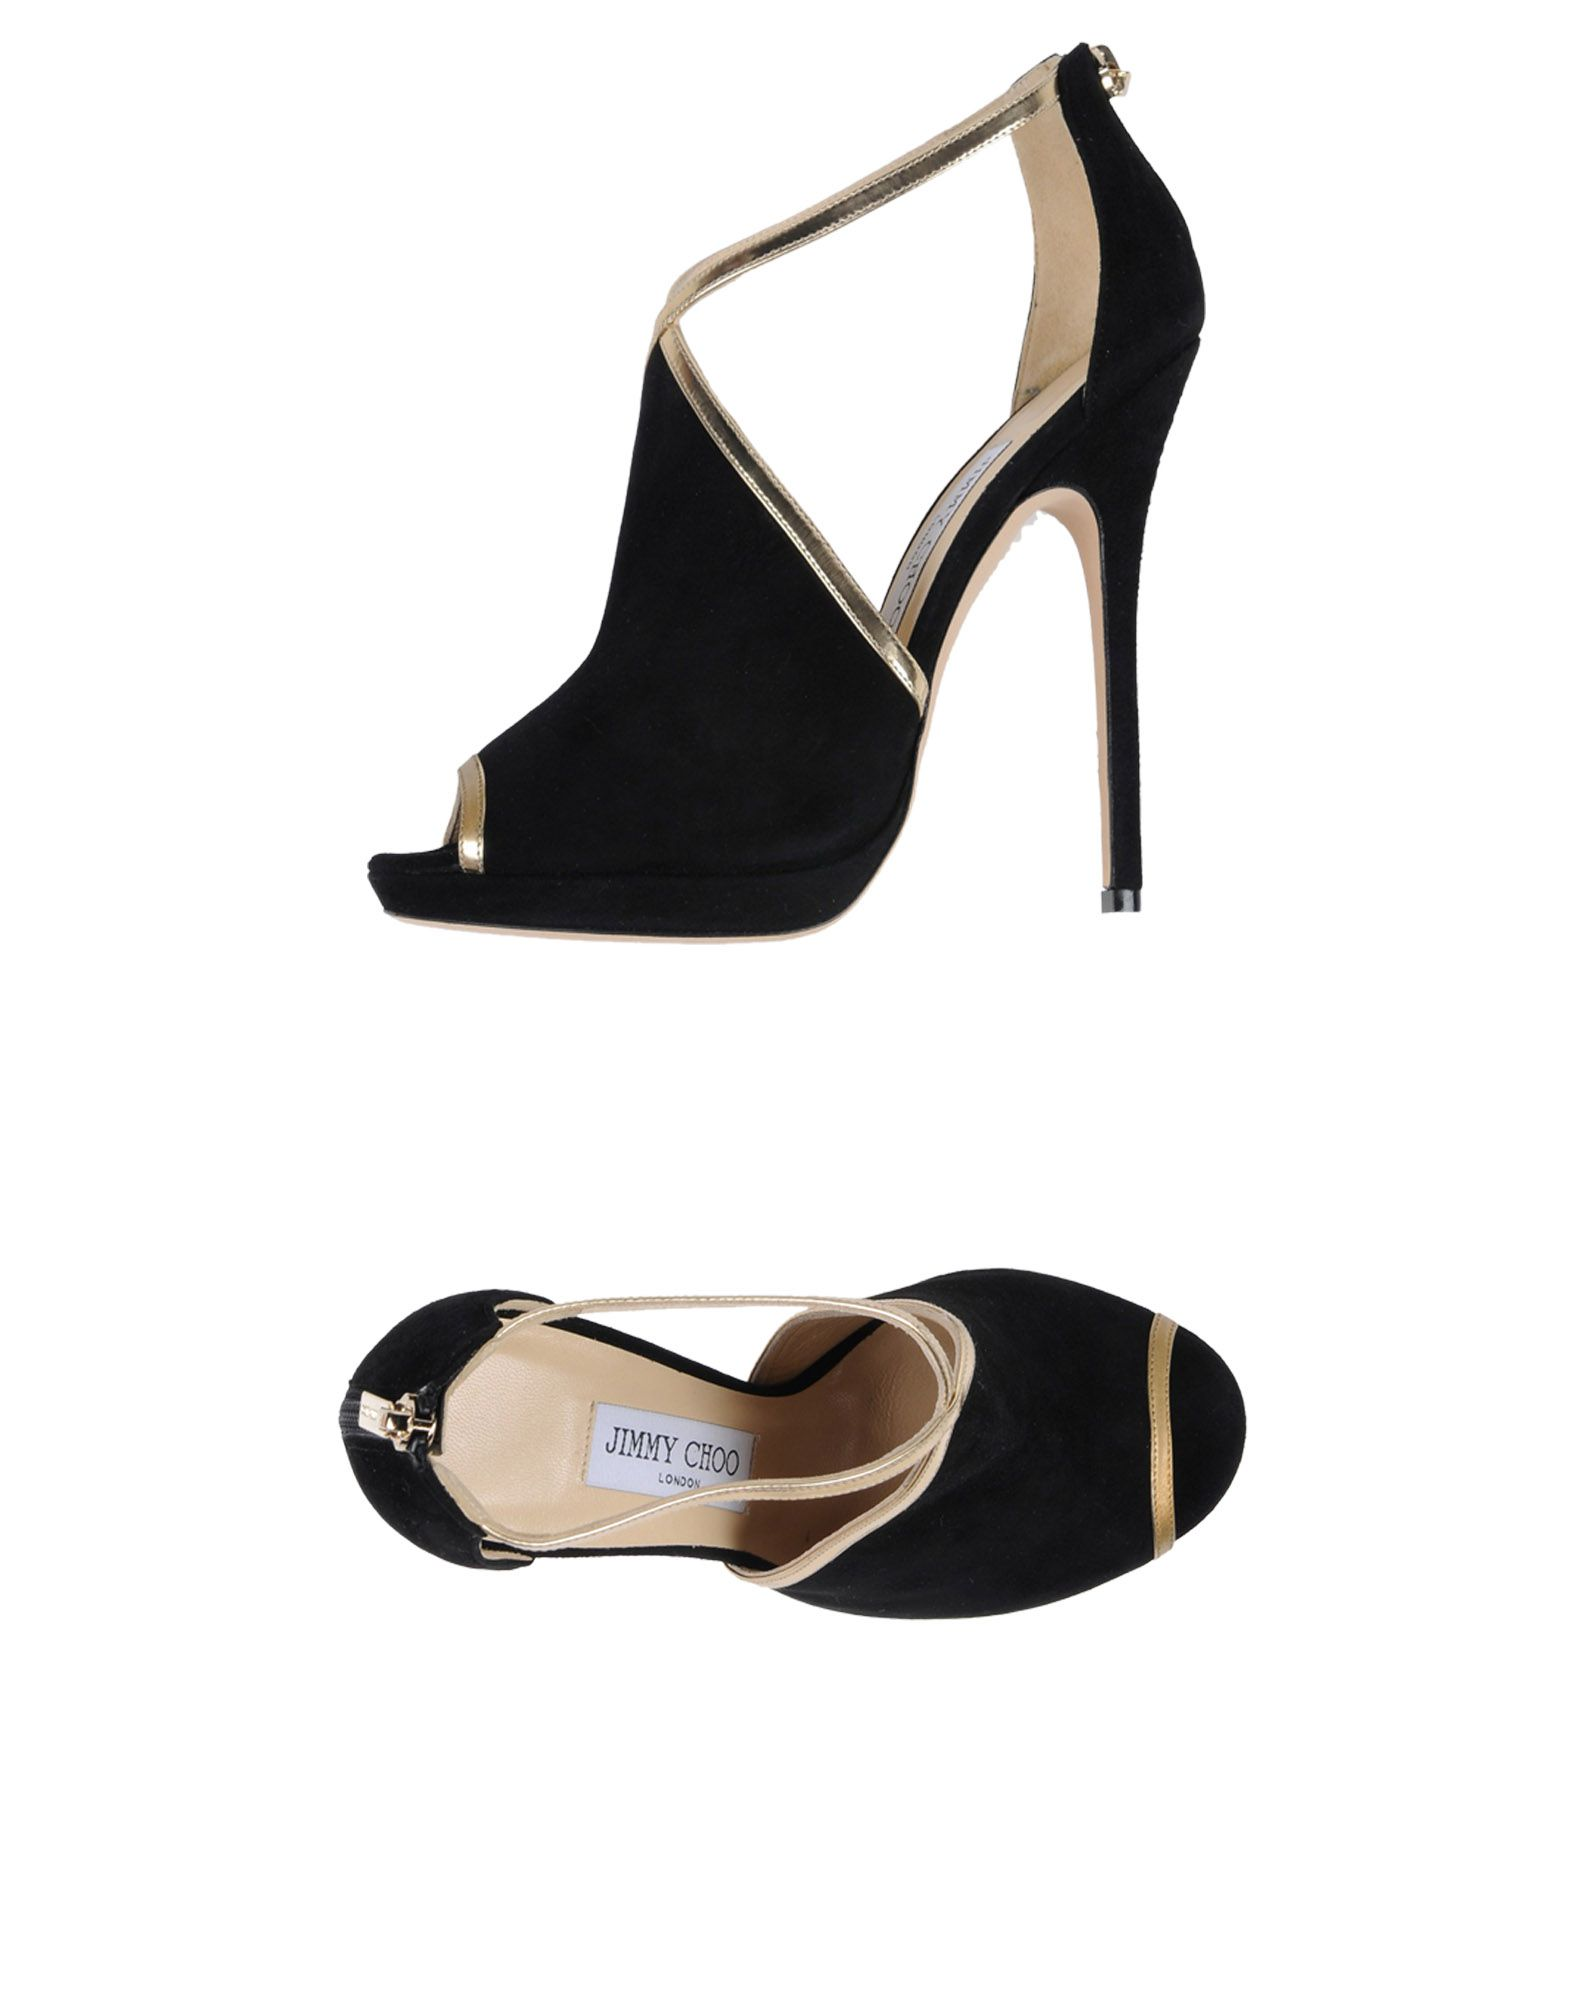 JIMMY CHOO Damen Sandale Farbe Schwarz Größe 8 jetztbilligerkaufen